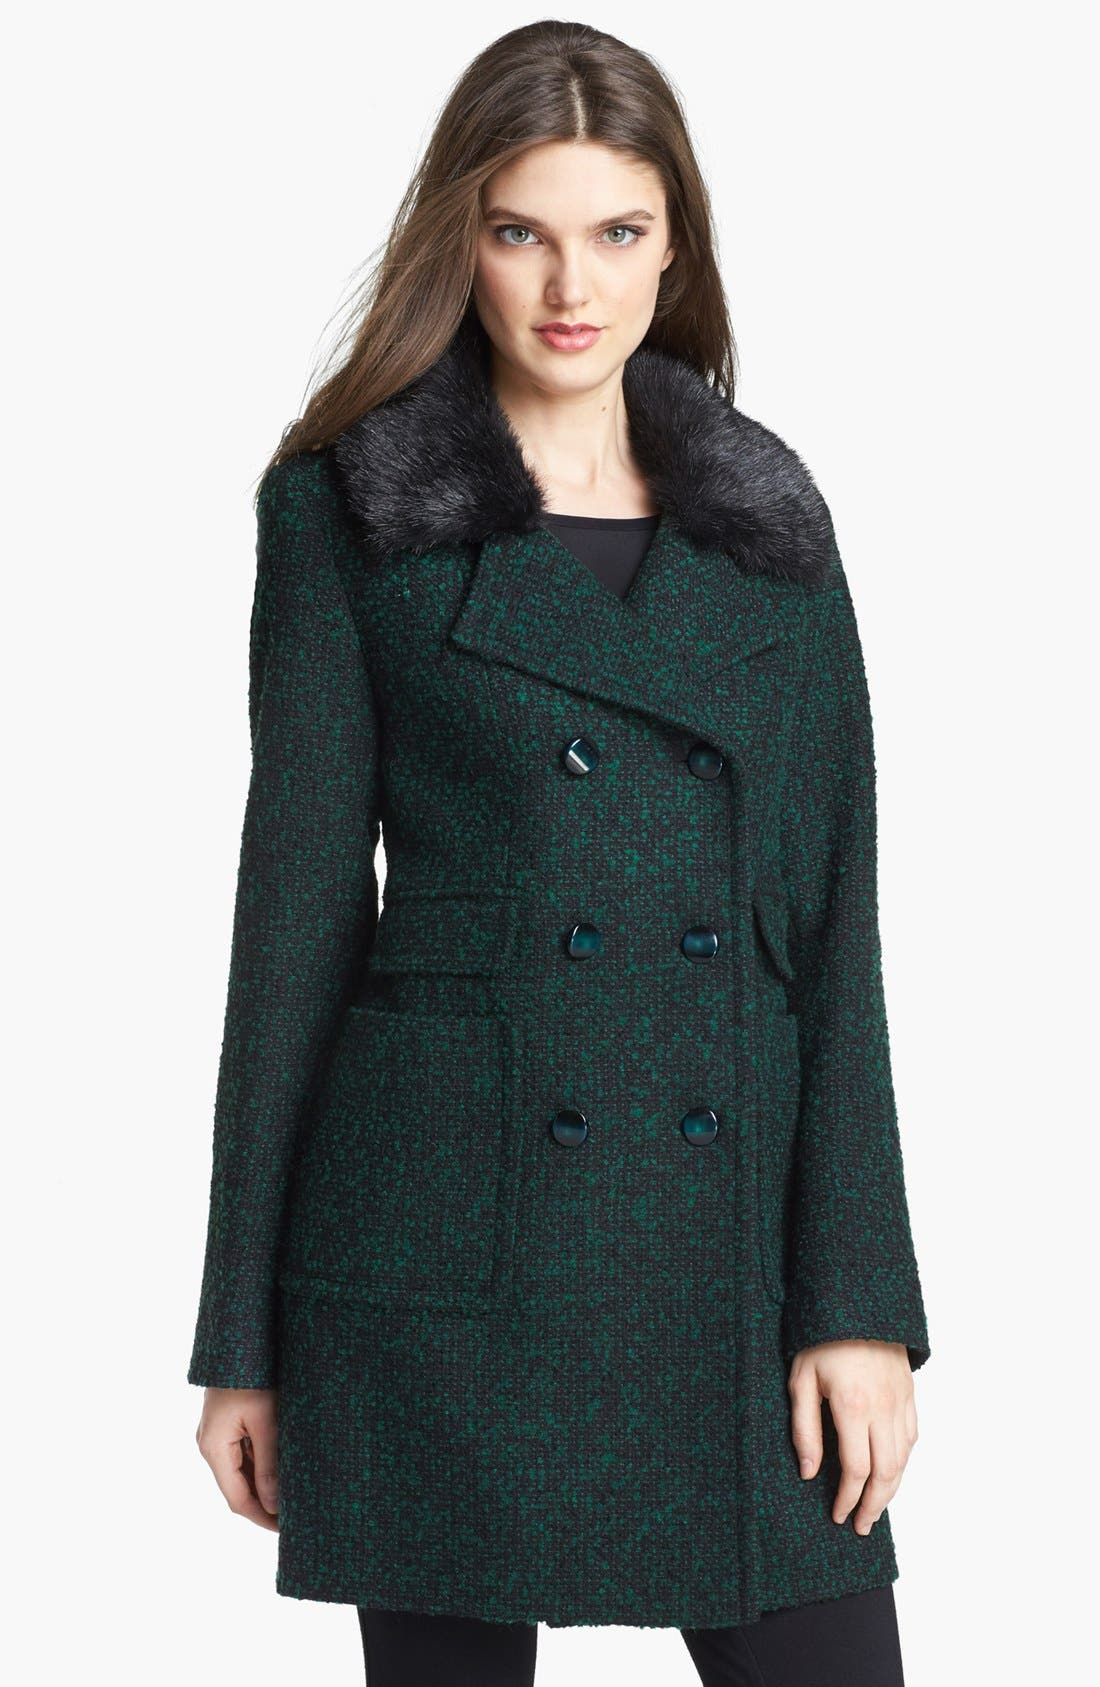 Alternate Image 1 Selected - Ivanka Trump Detachable Faux Fur Collar Tweed Coat